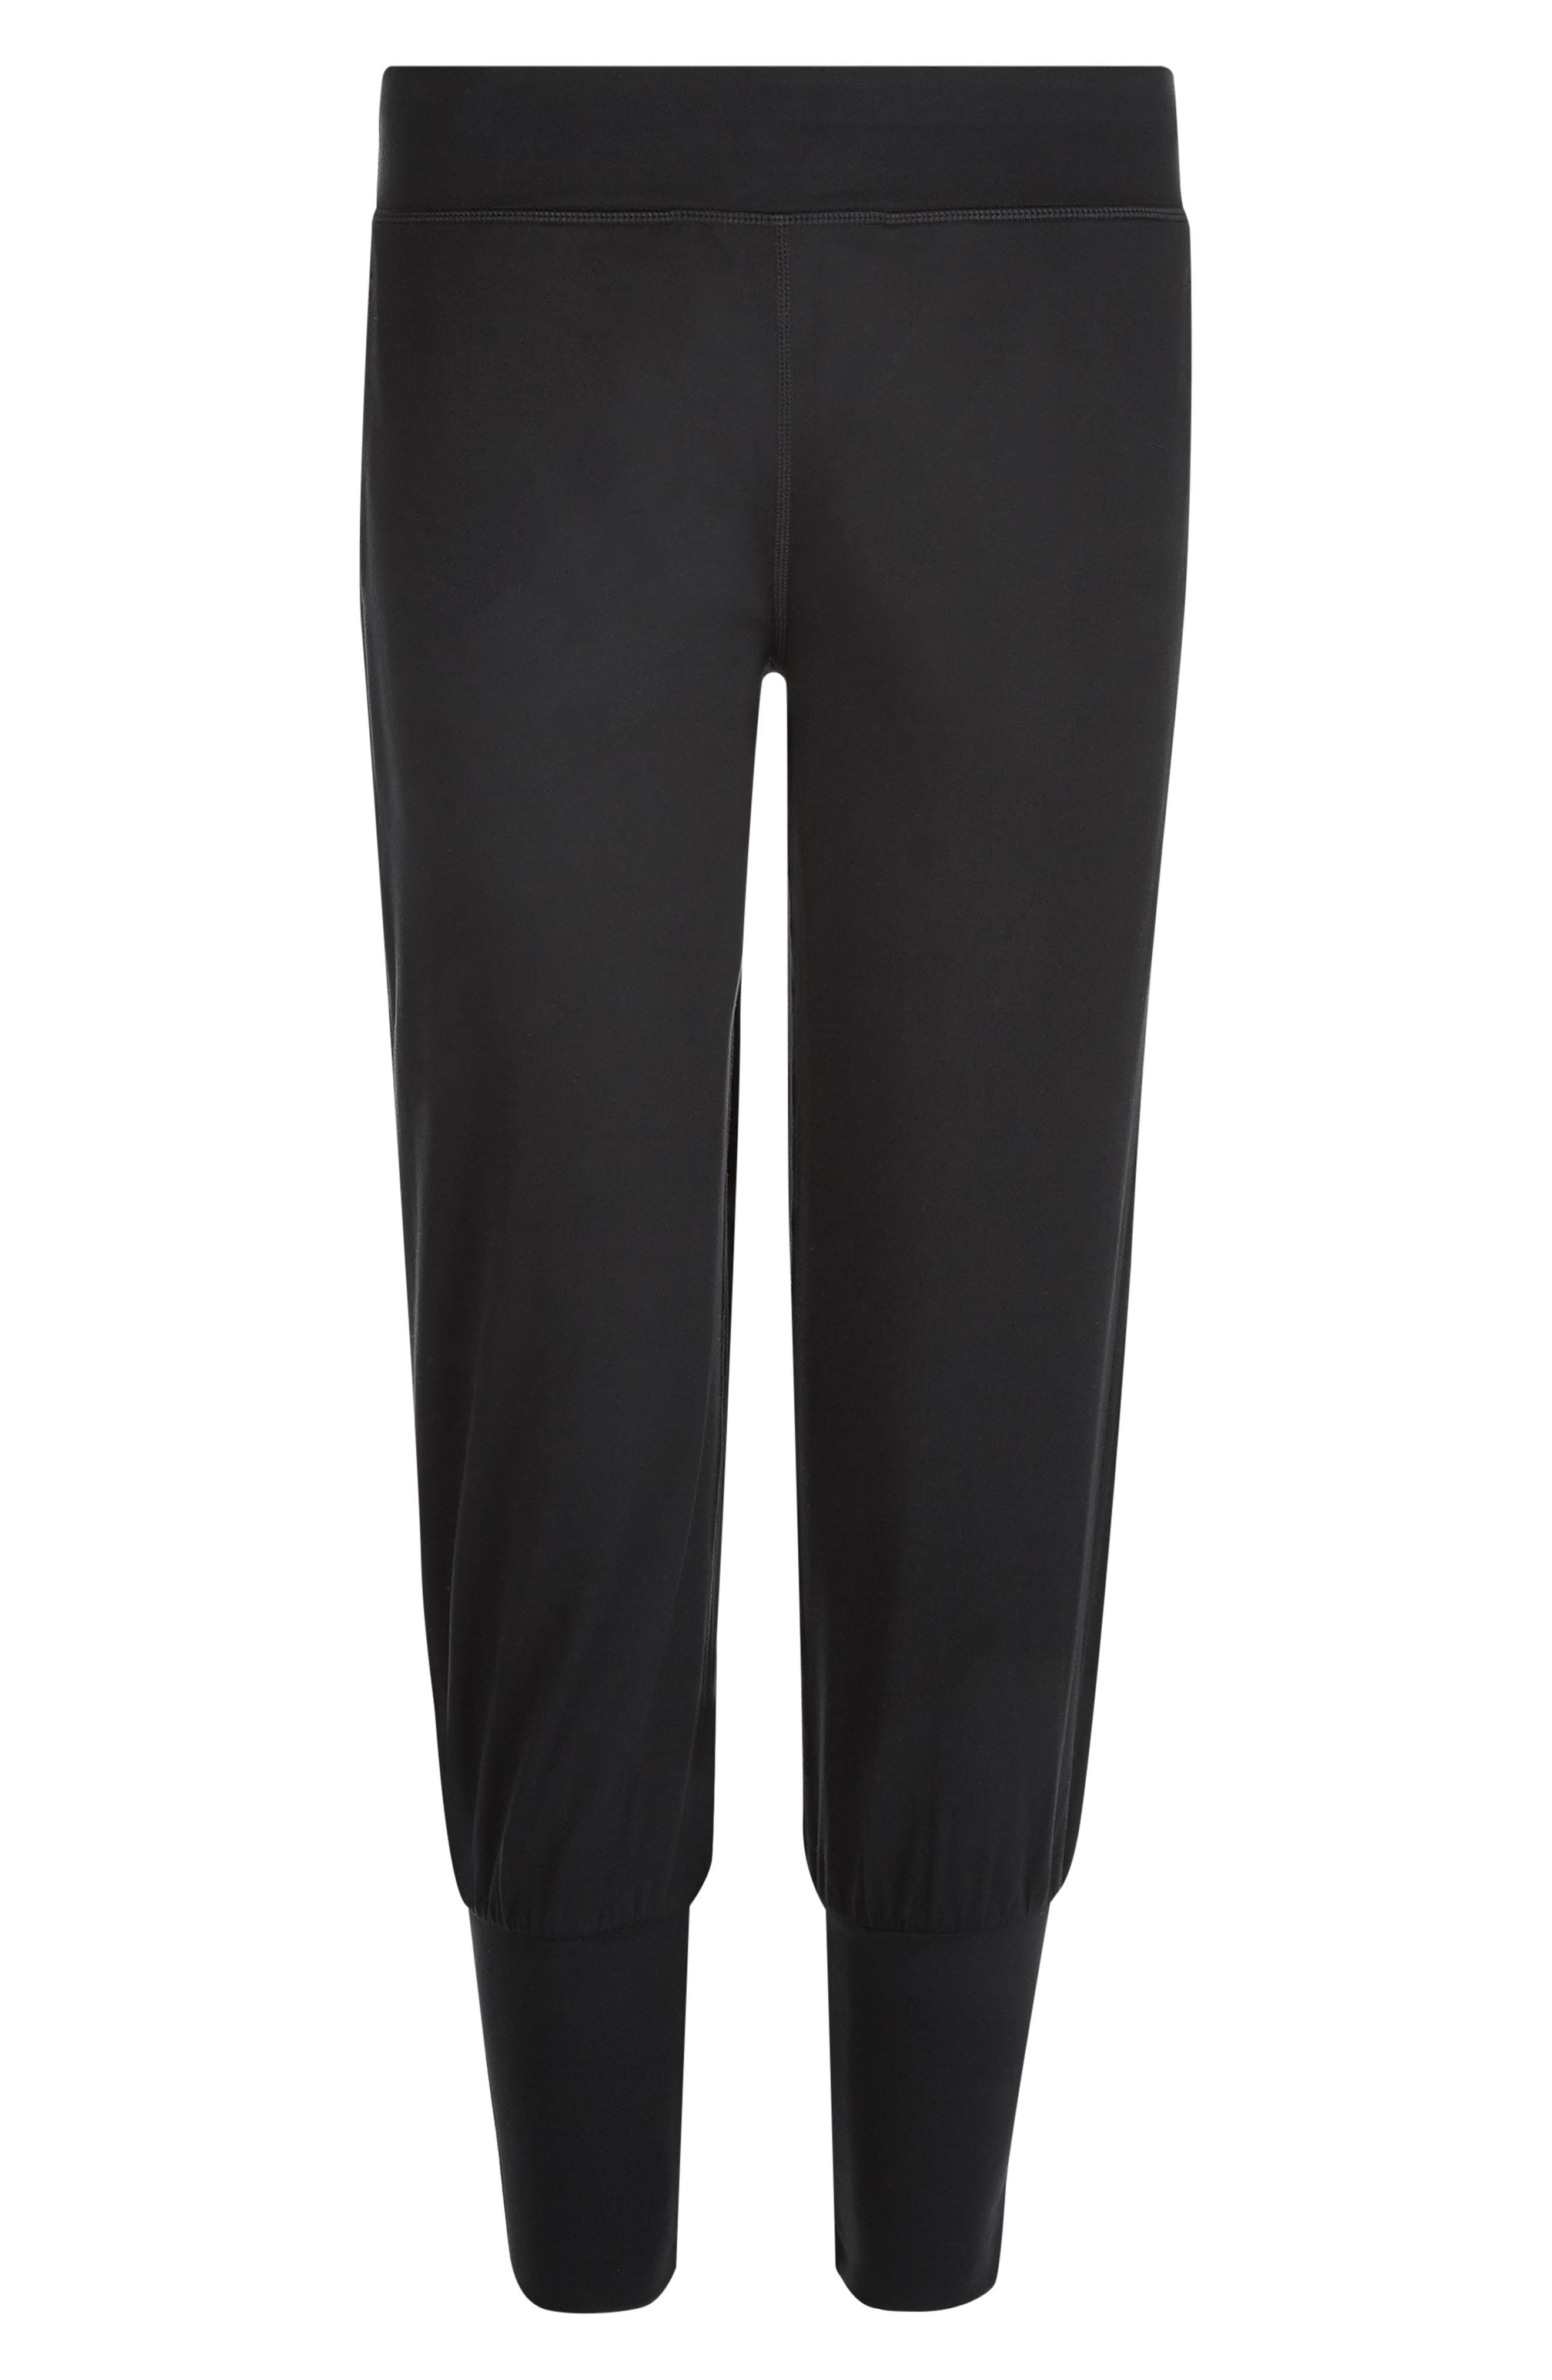 Garudasana Crop Yoga Trousers,                             Alternate thumbnail 7, color,                             BLACK